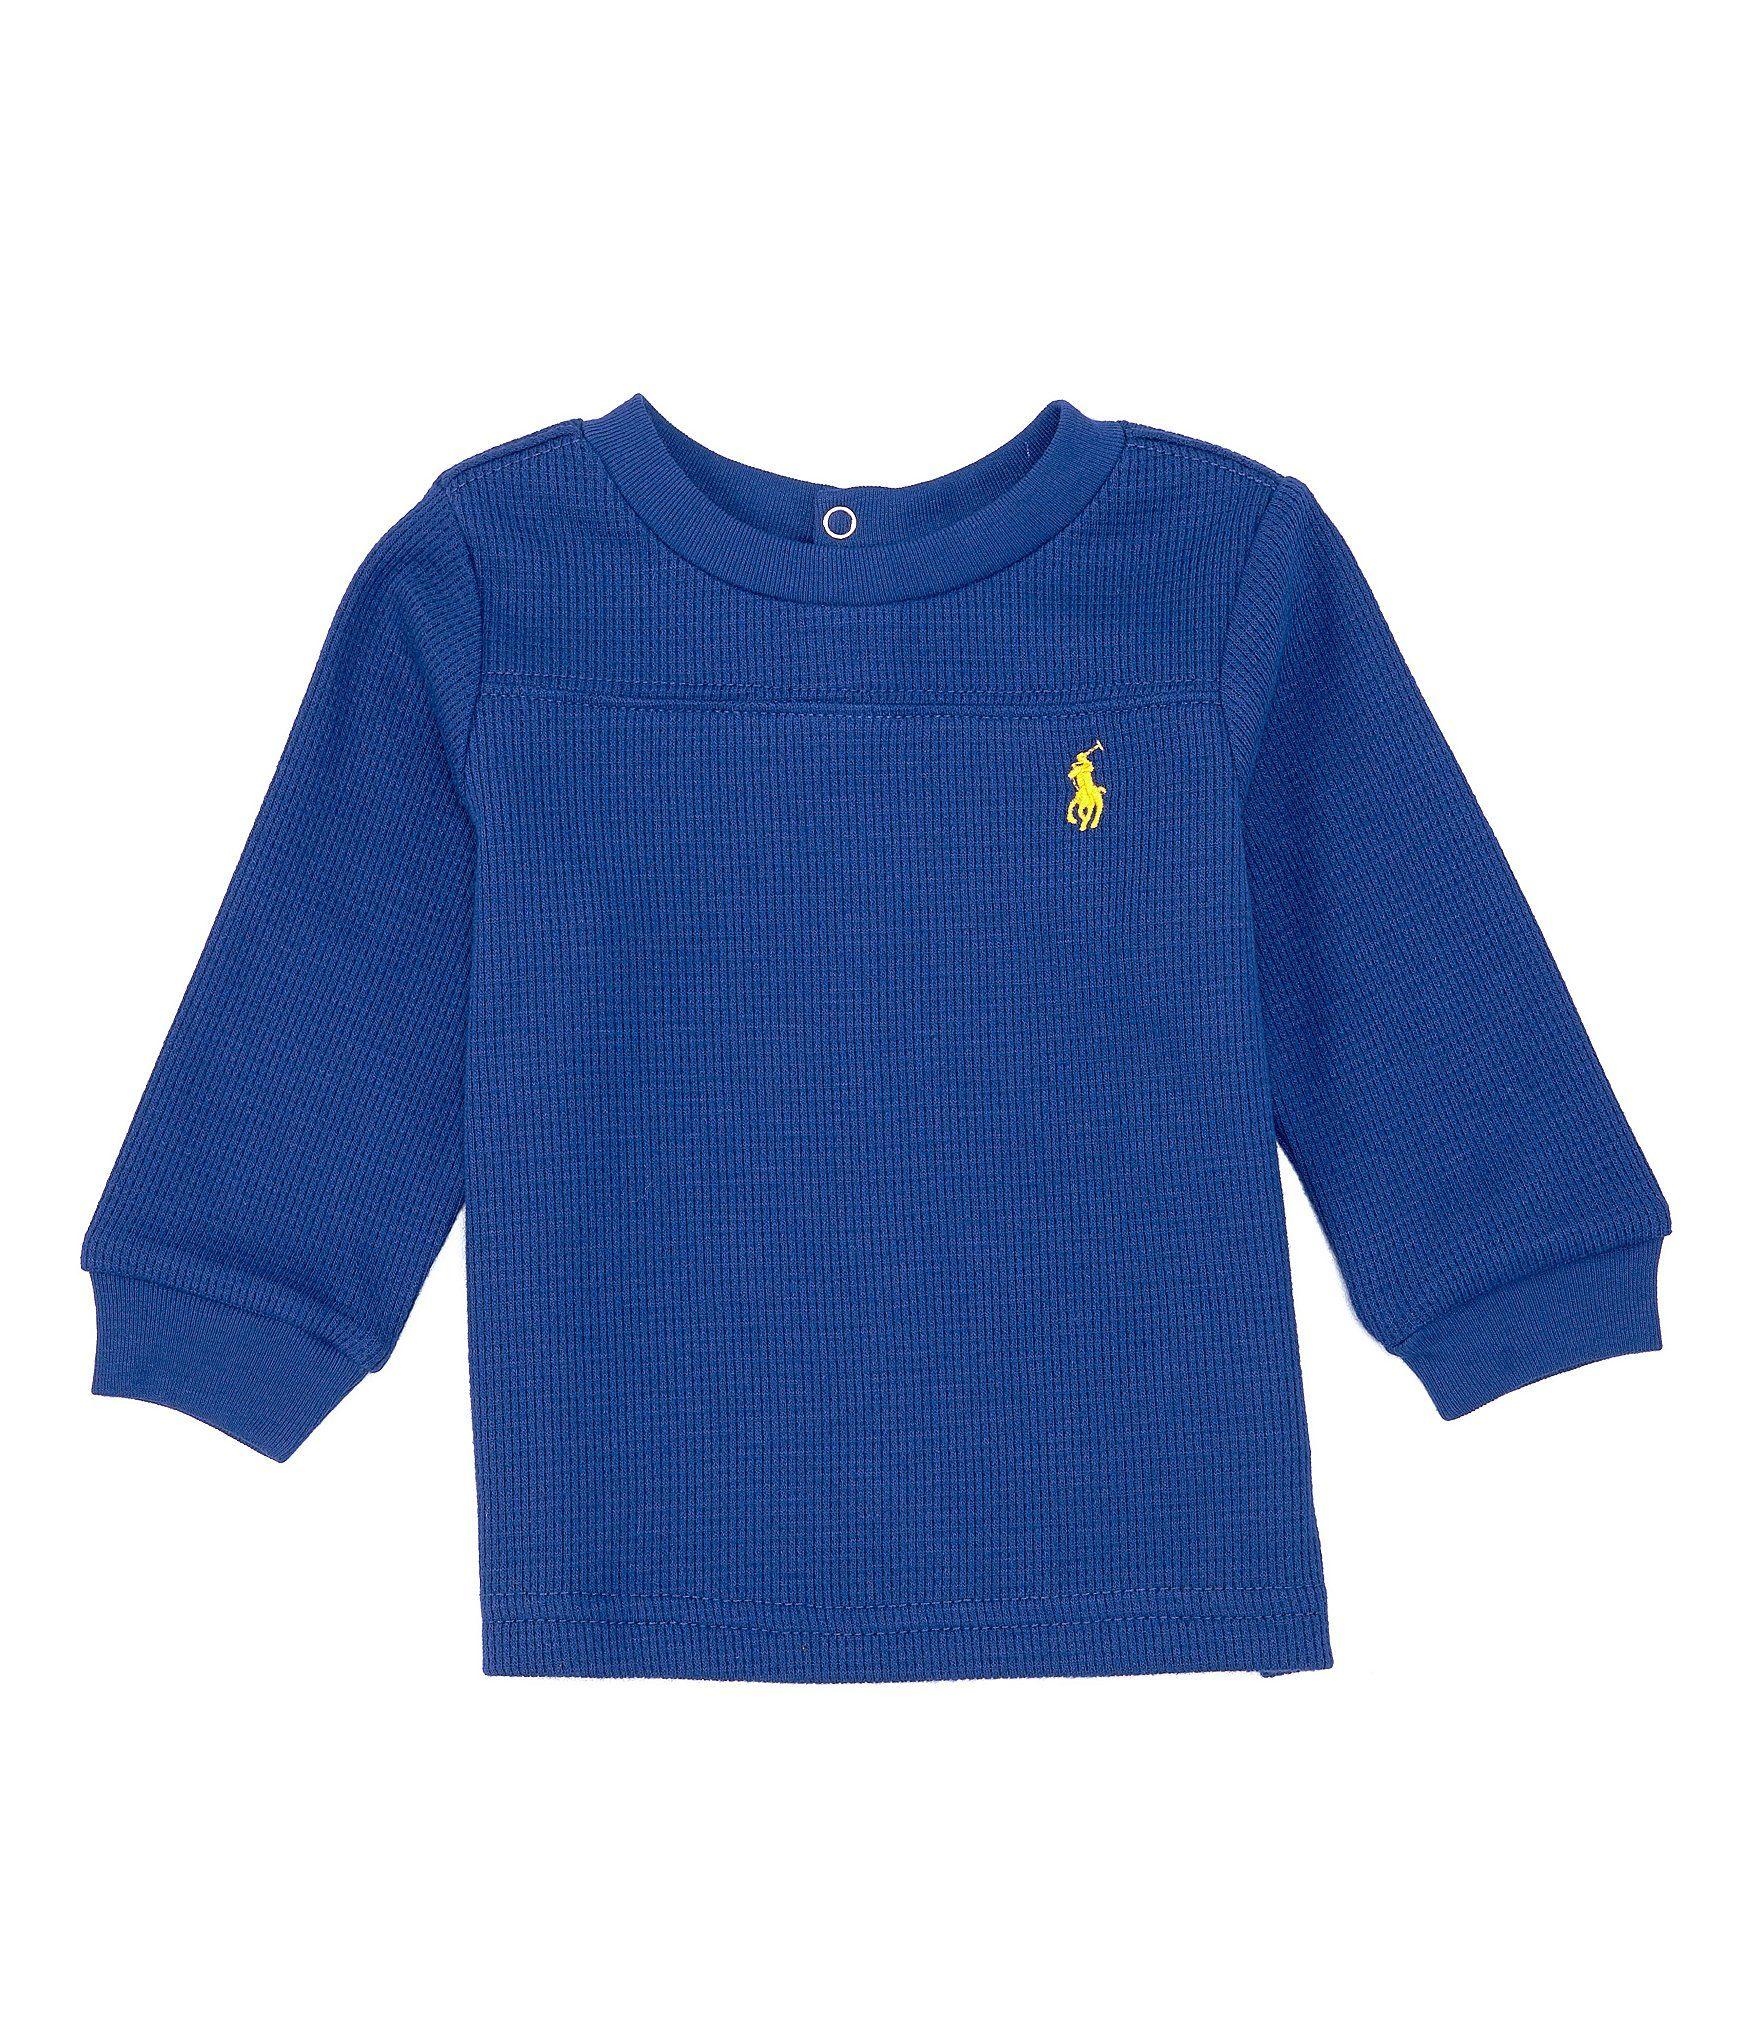 Photo of Ralph Lauren Childrenswear Baby Boys 3-24 Months Long-Sleeve Waffle-Knit Tee | Dillard's